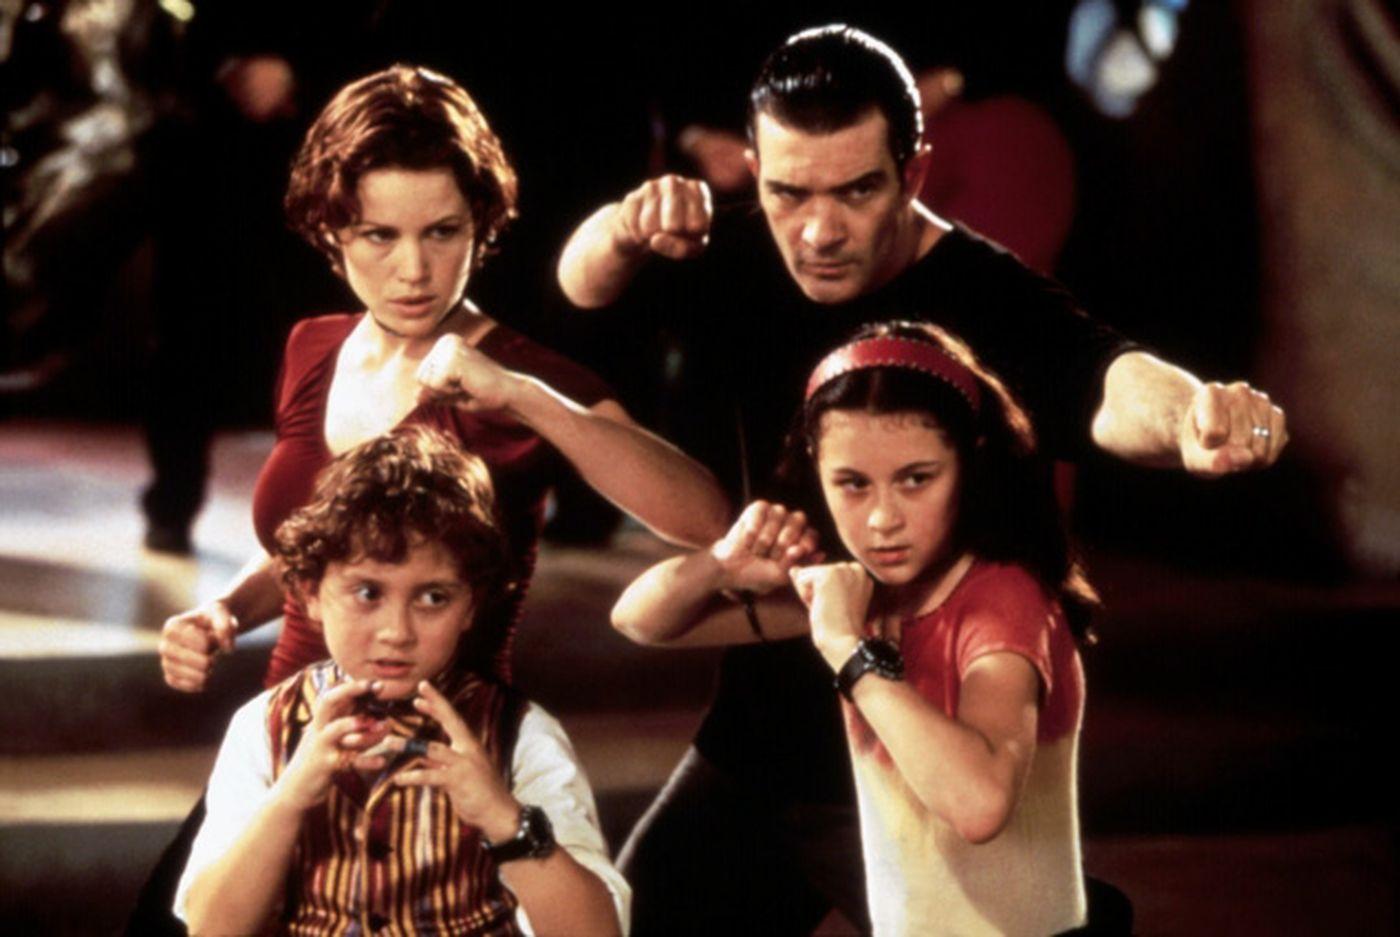 The Cortez Family - Carla Gugino, Antonio Banderas, Daryl Sabara, Alexa Vega in Spy Kids (2001)